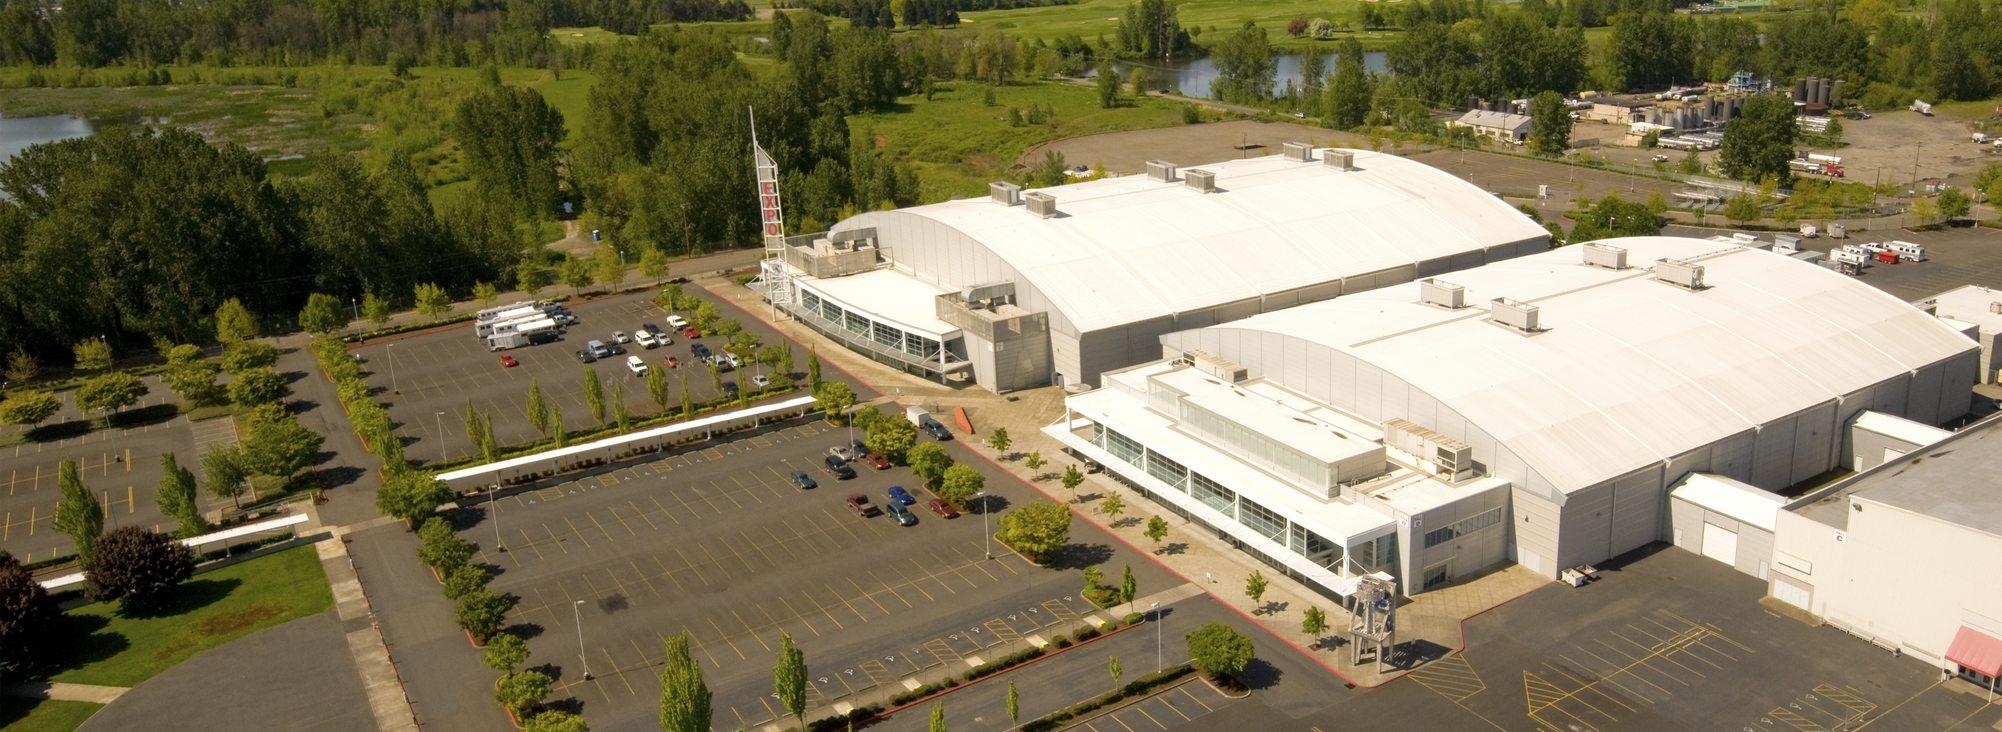 Expo Center aerial